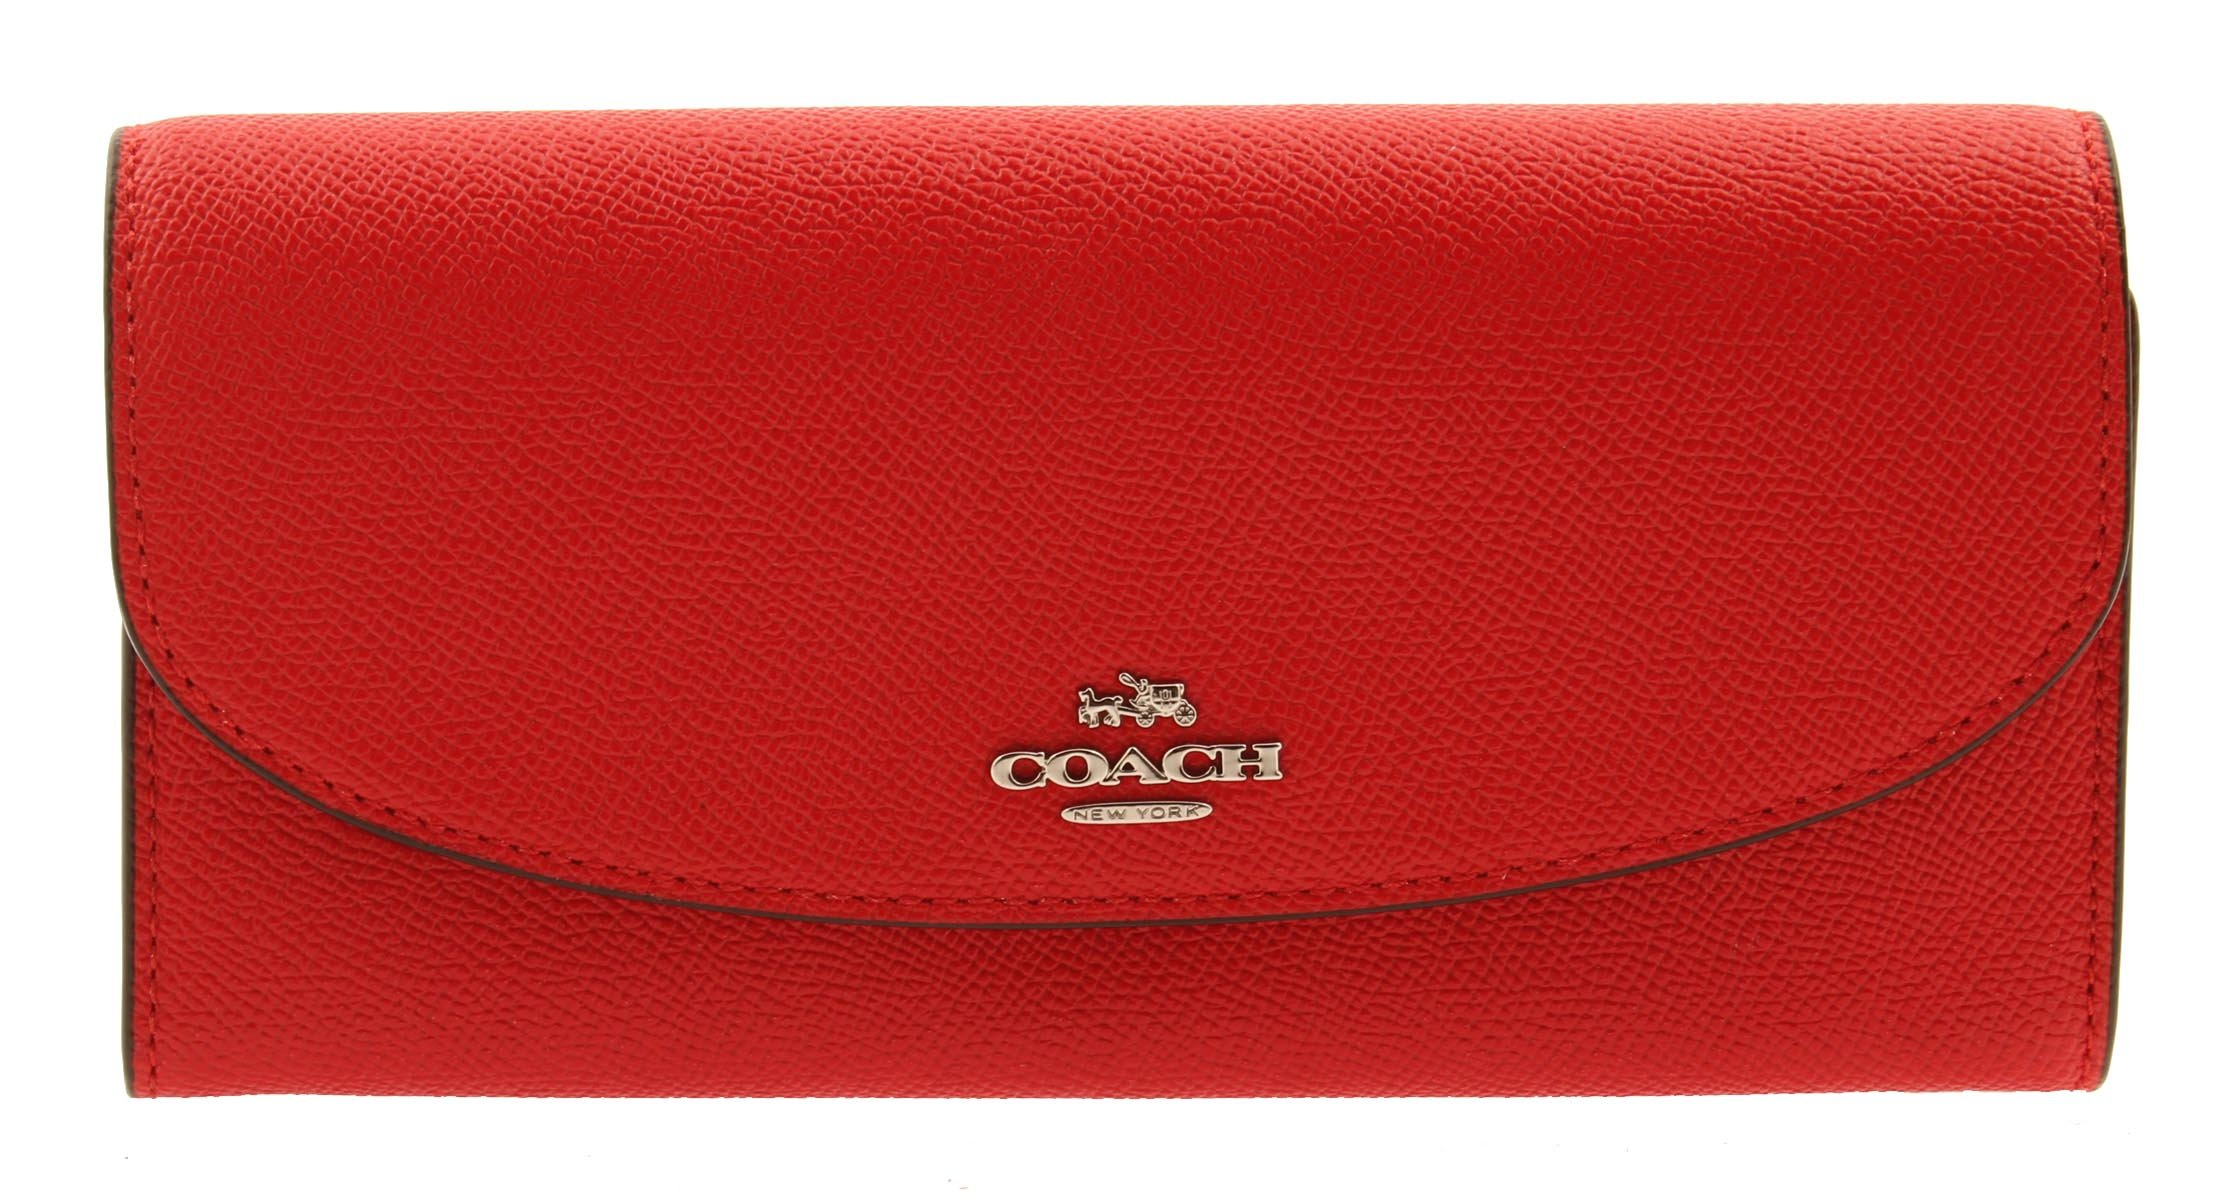 COACH Crossgrain Leather Slim Envelope Wallet (Bright Red)